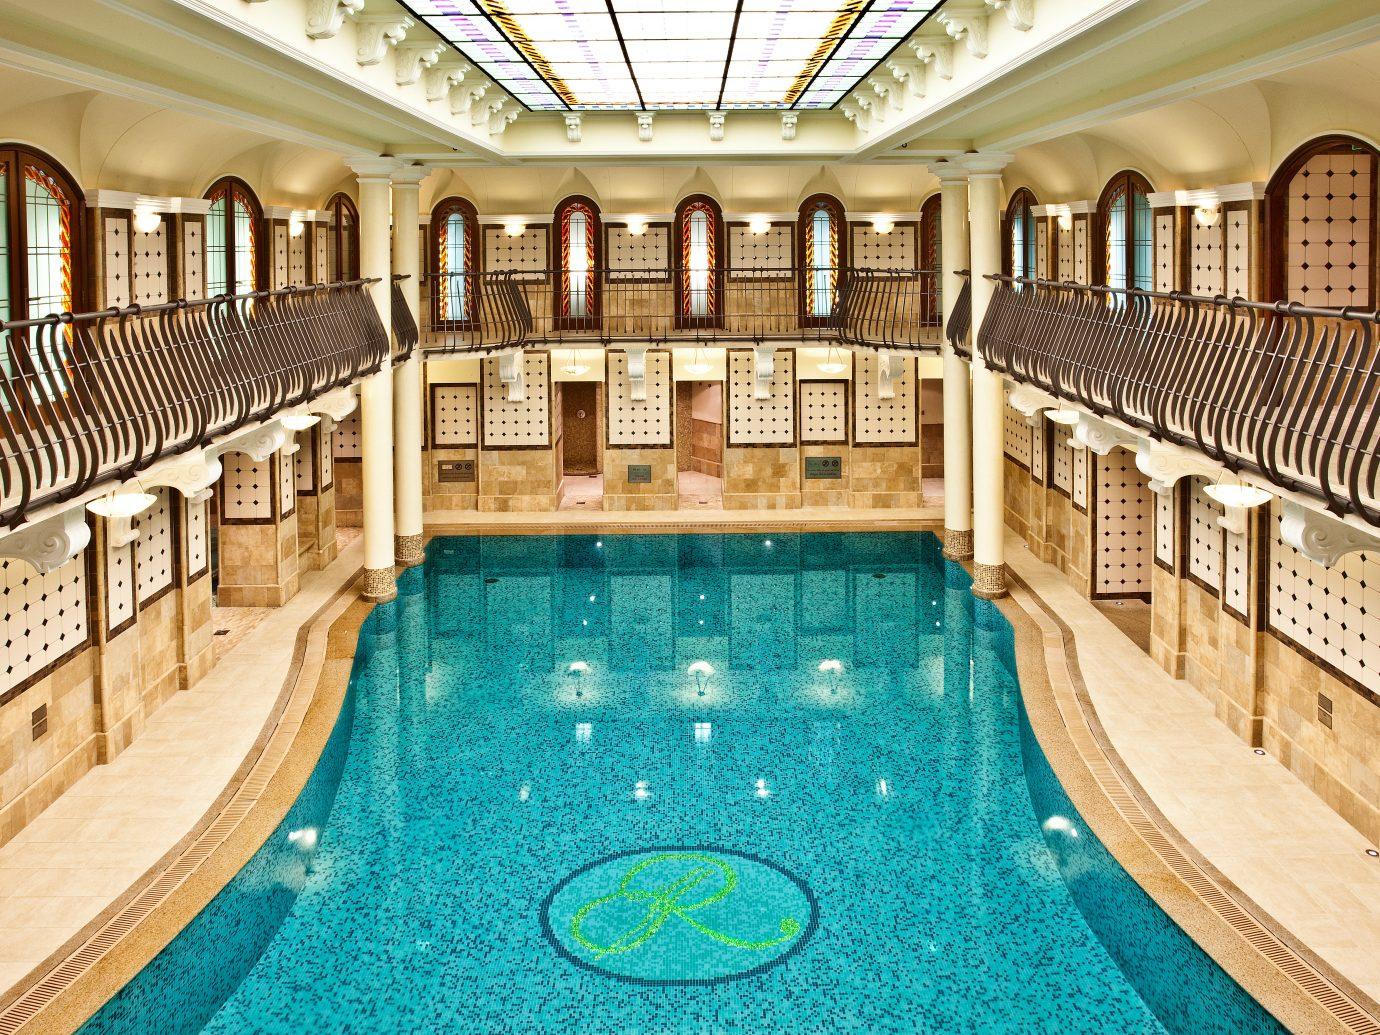 City Elegant Family Historic Luxury Pool Trip Ideas indoor floor ceiling swimming pool property estate leisure palace mansion Resort furniture